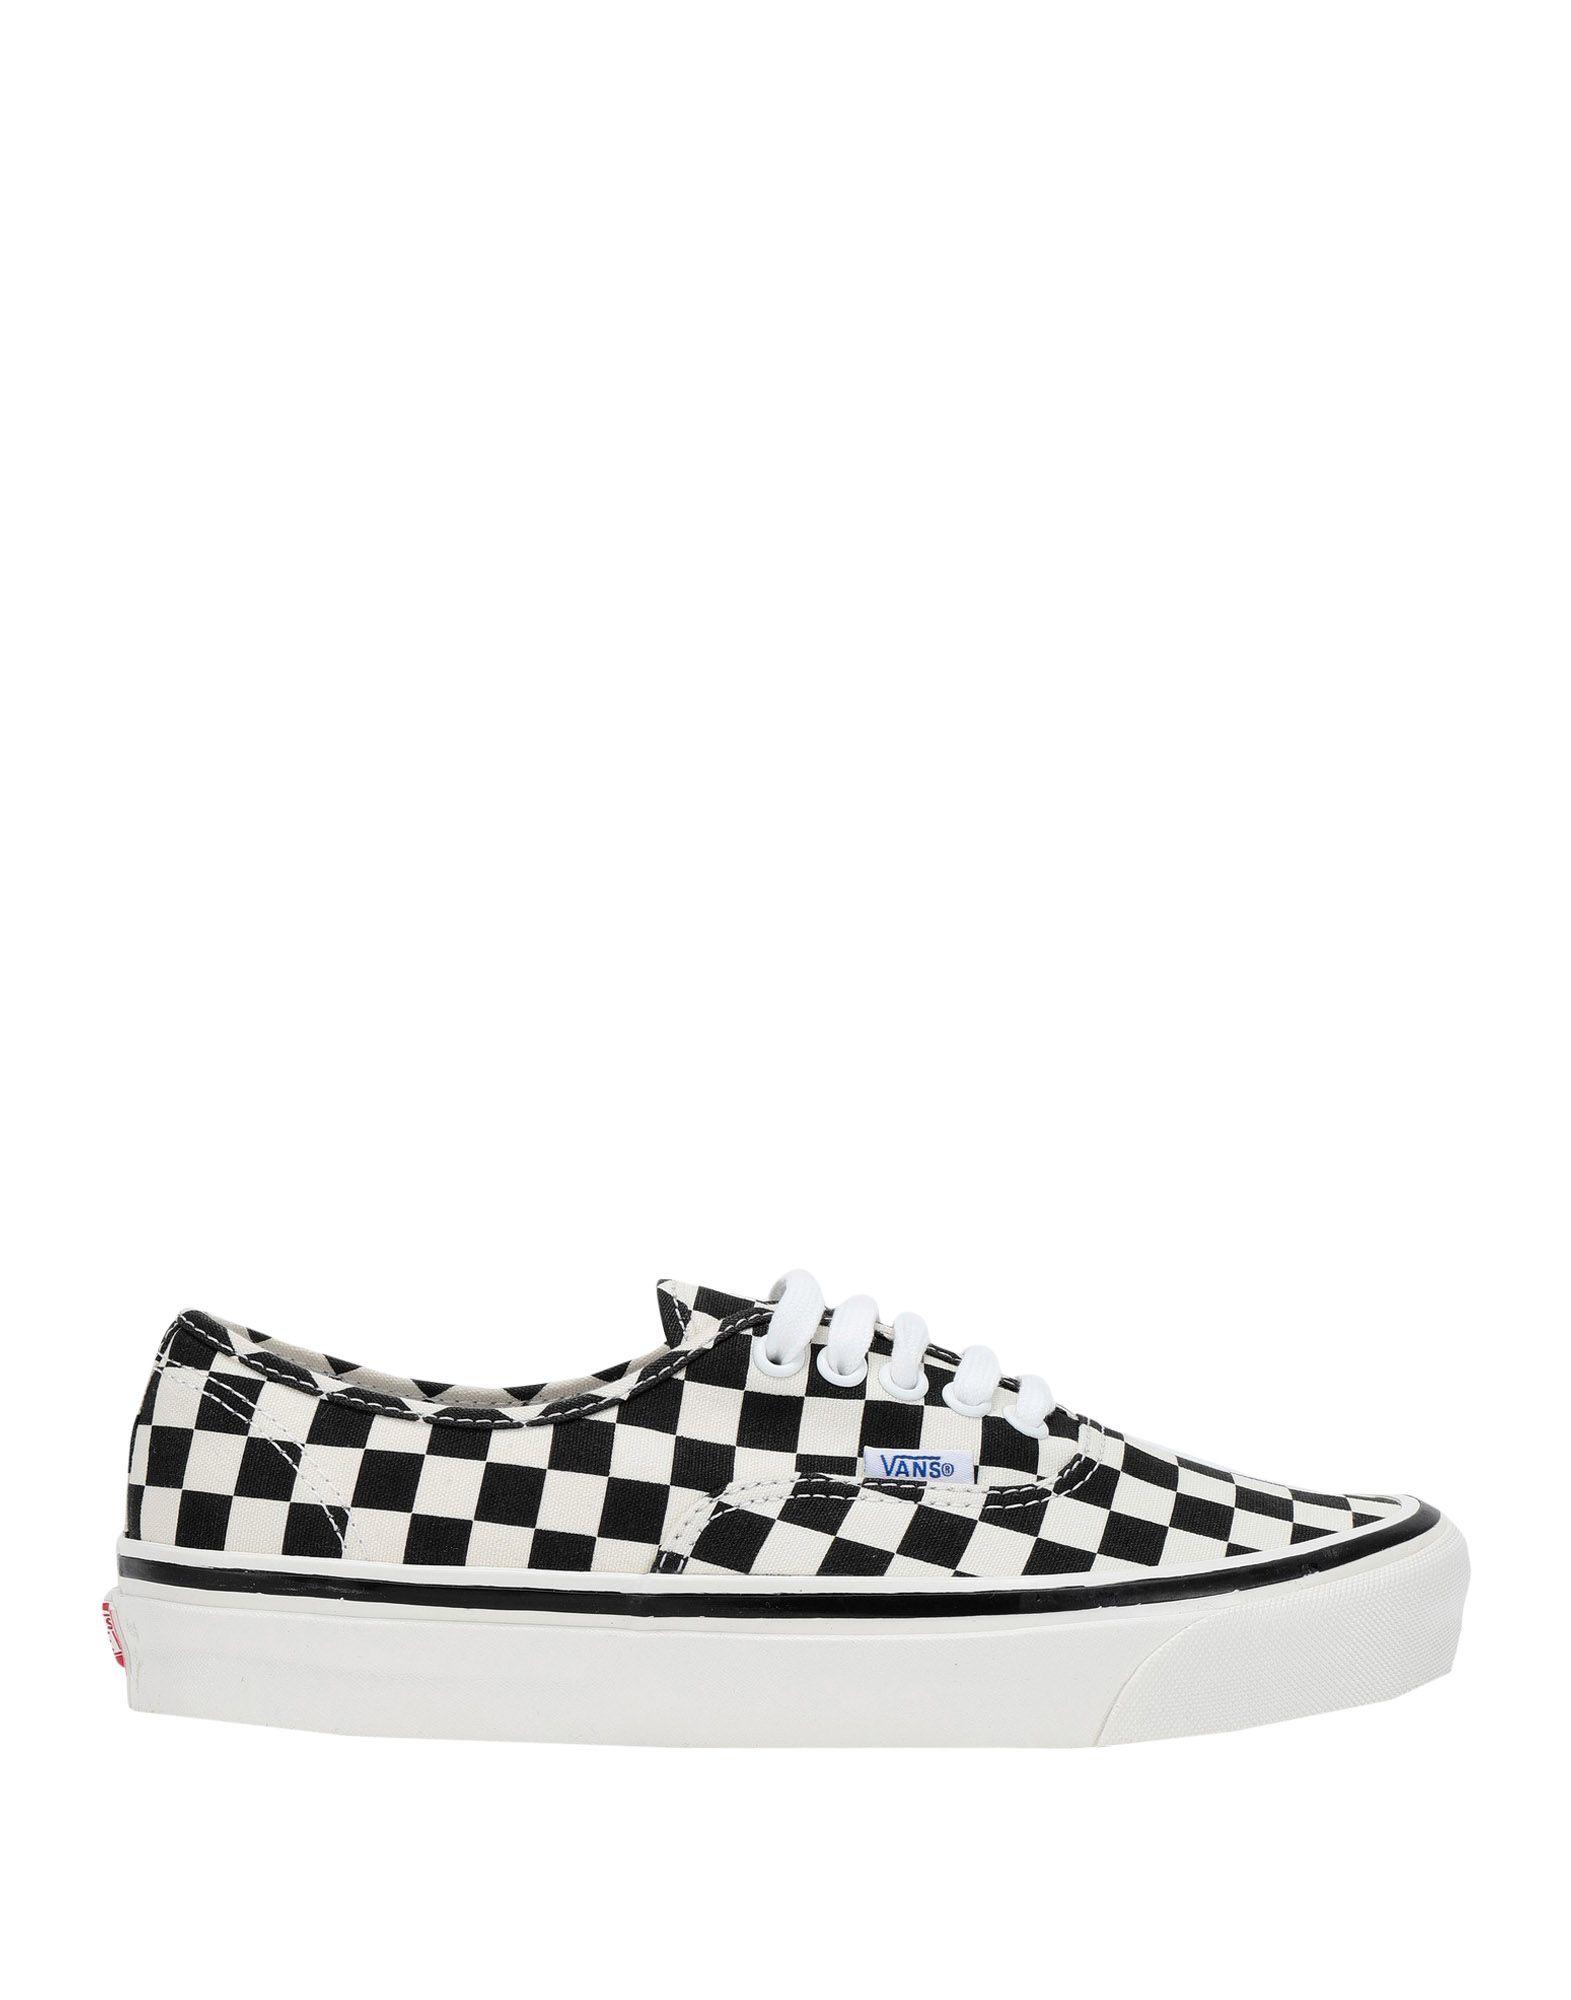 Vans Vn0a38enoak1Ua Authentic 44 Dx Anaheim Factory - Sneakers Sneakers - Women Vans Sneakers - online on  Australia - 11576970MT 685d85